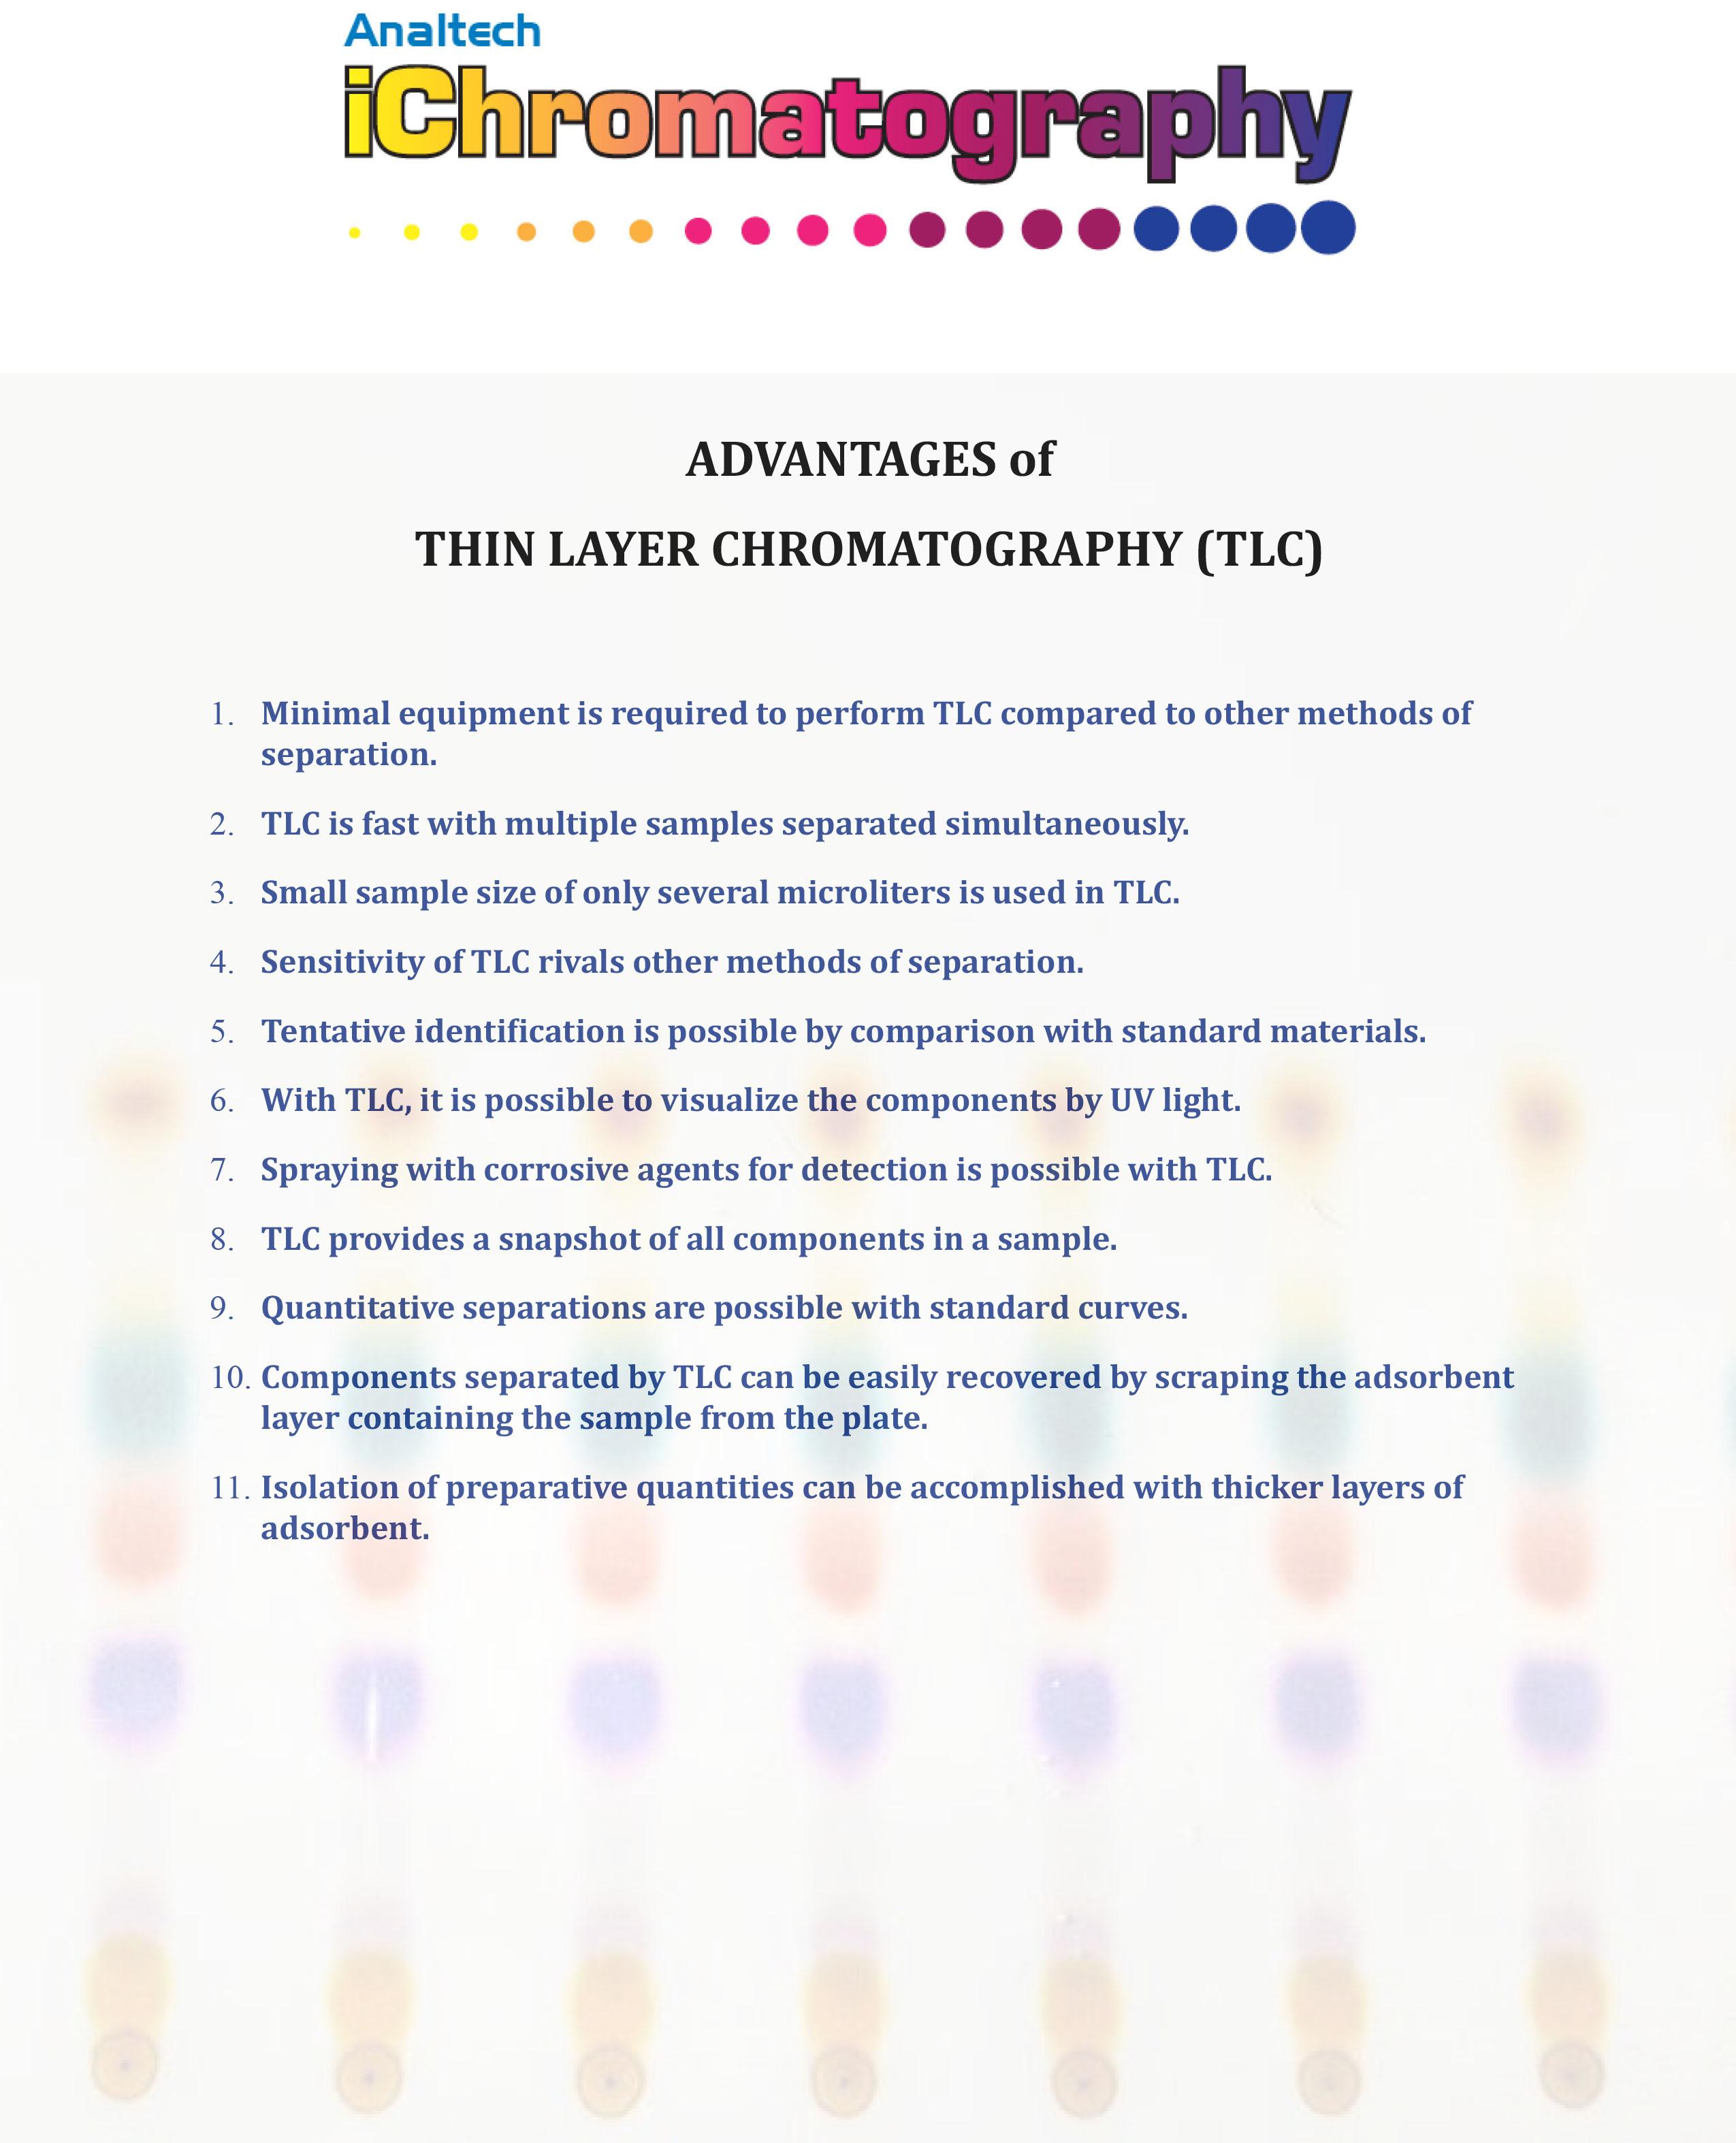 tlc-advantages.jpg